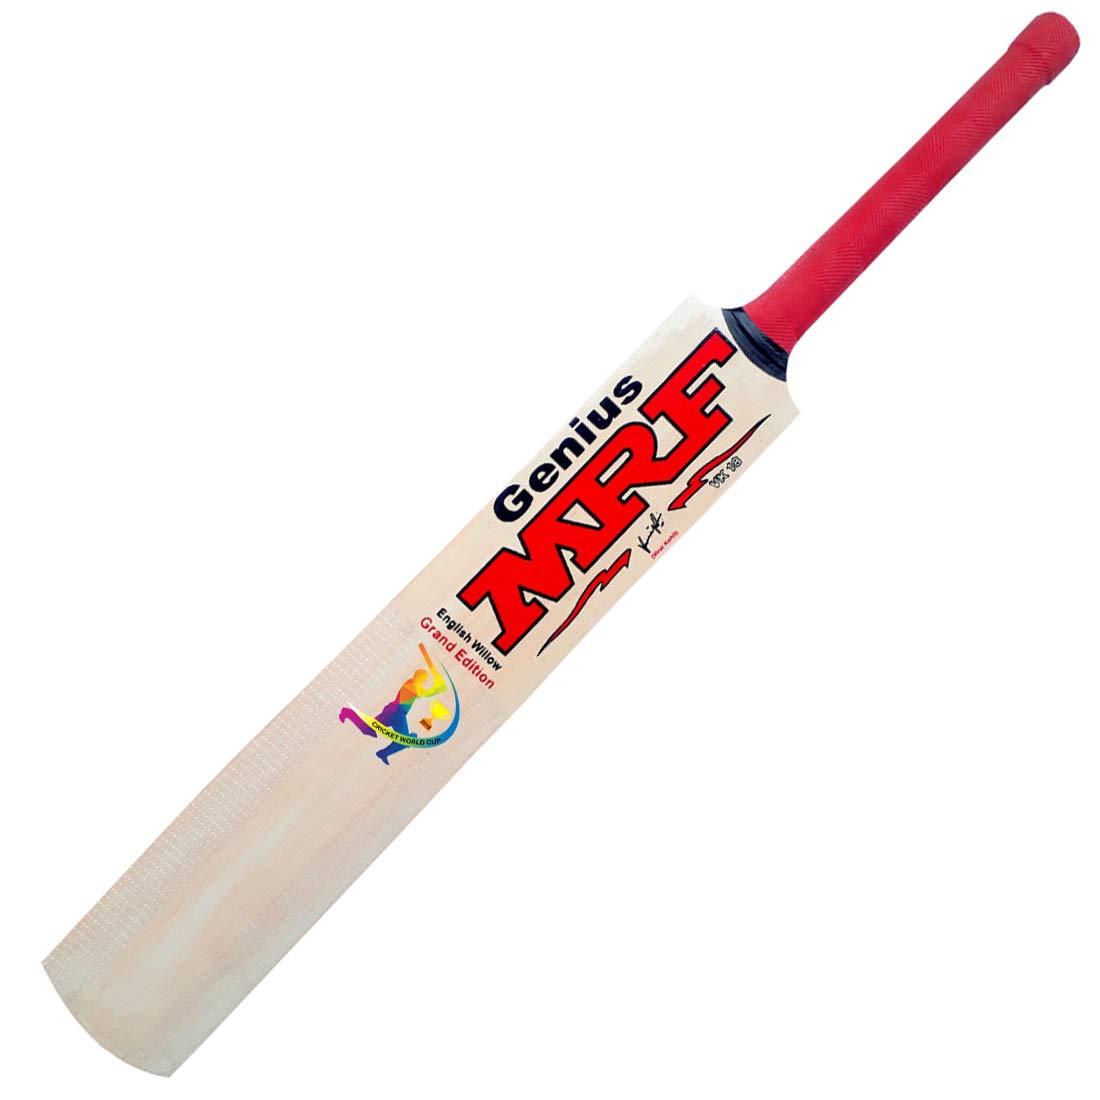 Fabulous-MRF-Genius-Virat-Kohli-Popular-Willow-Short-Handle-Cricket-Bat